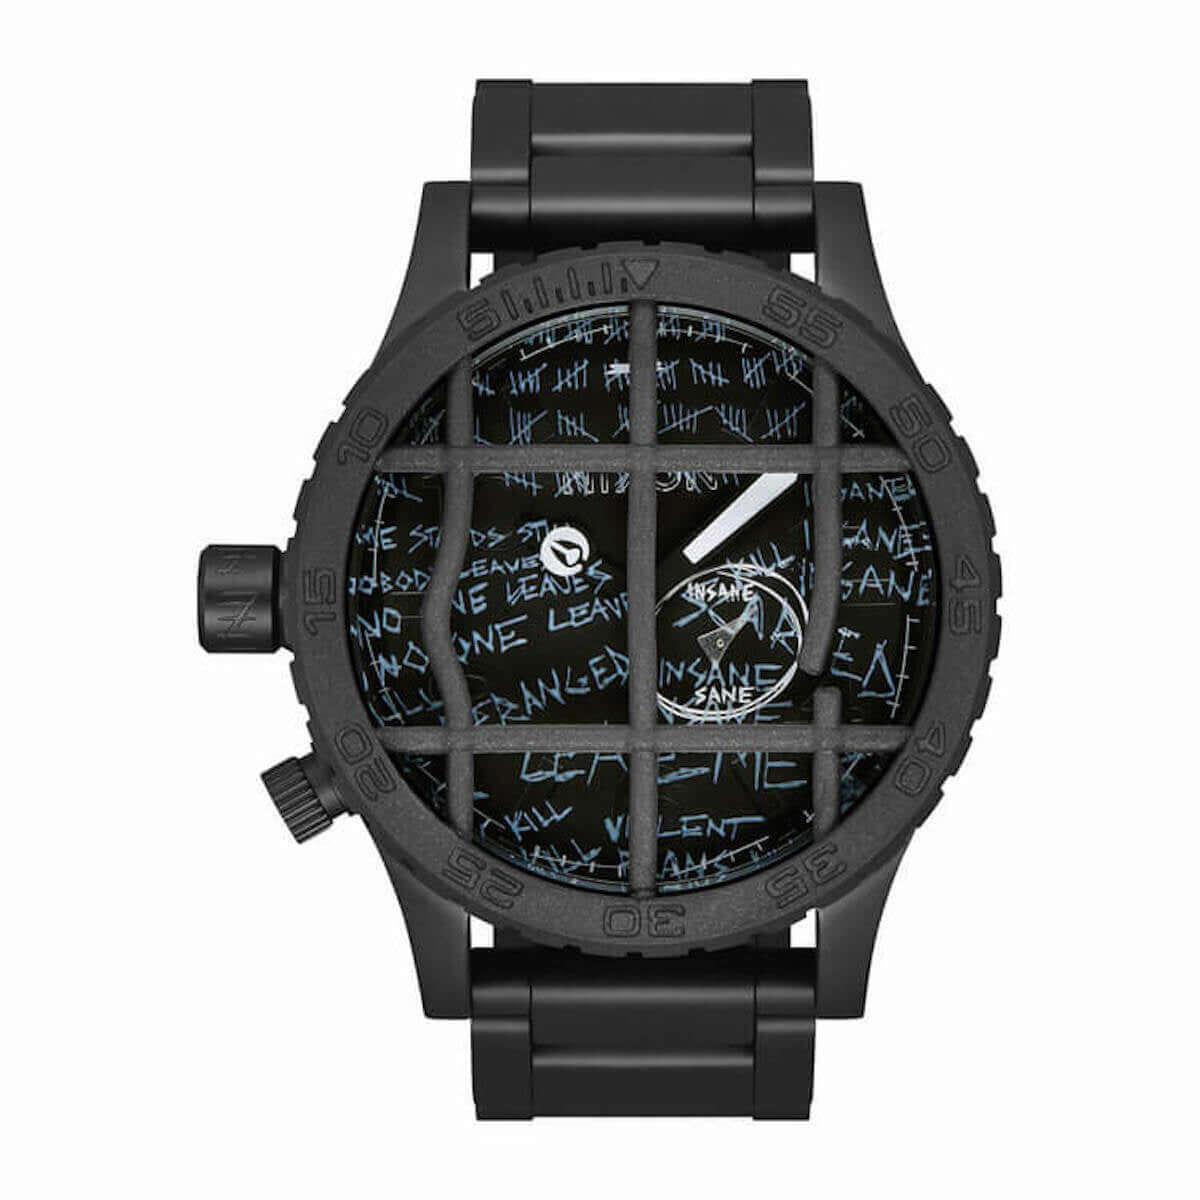 METALLICA X NIXON メタリカの名盤が腕時計に! music181112_nixon-metallica_11-1200x1200